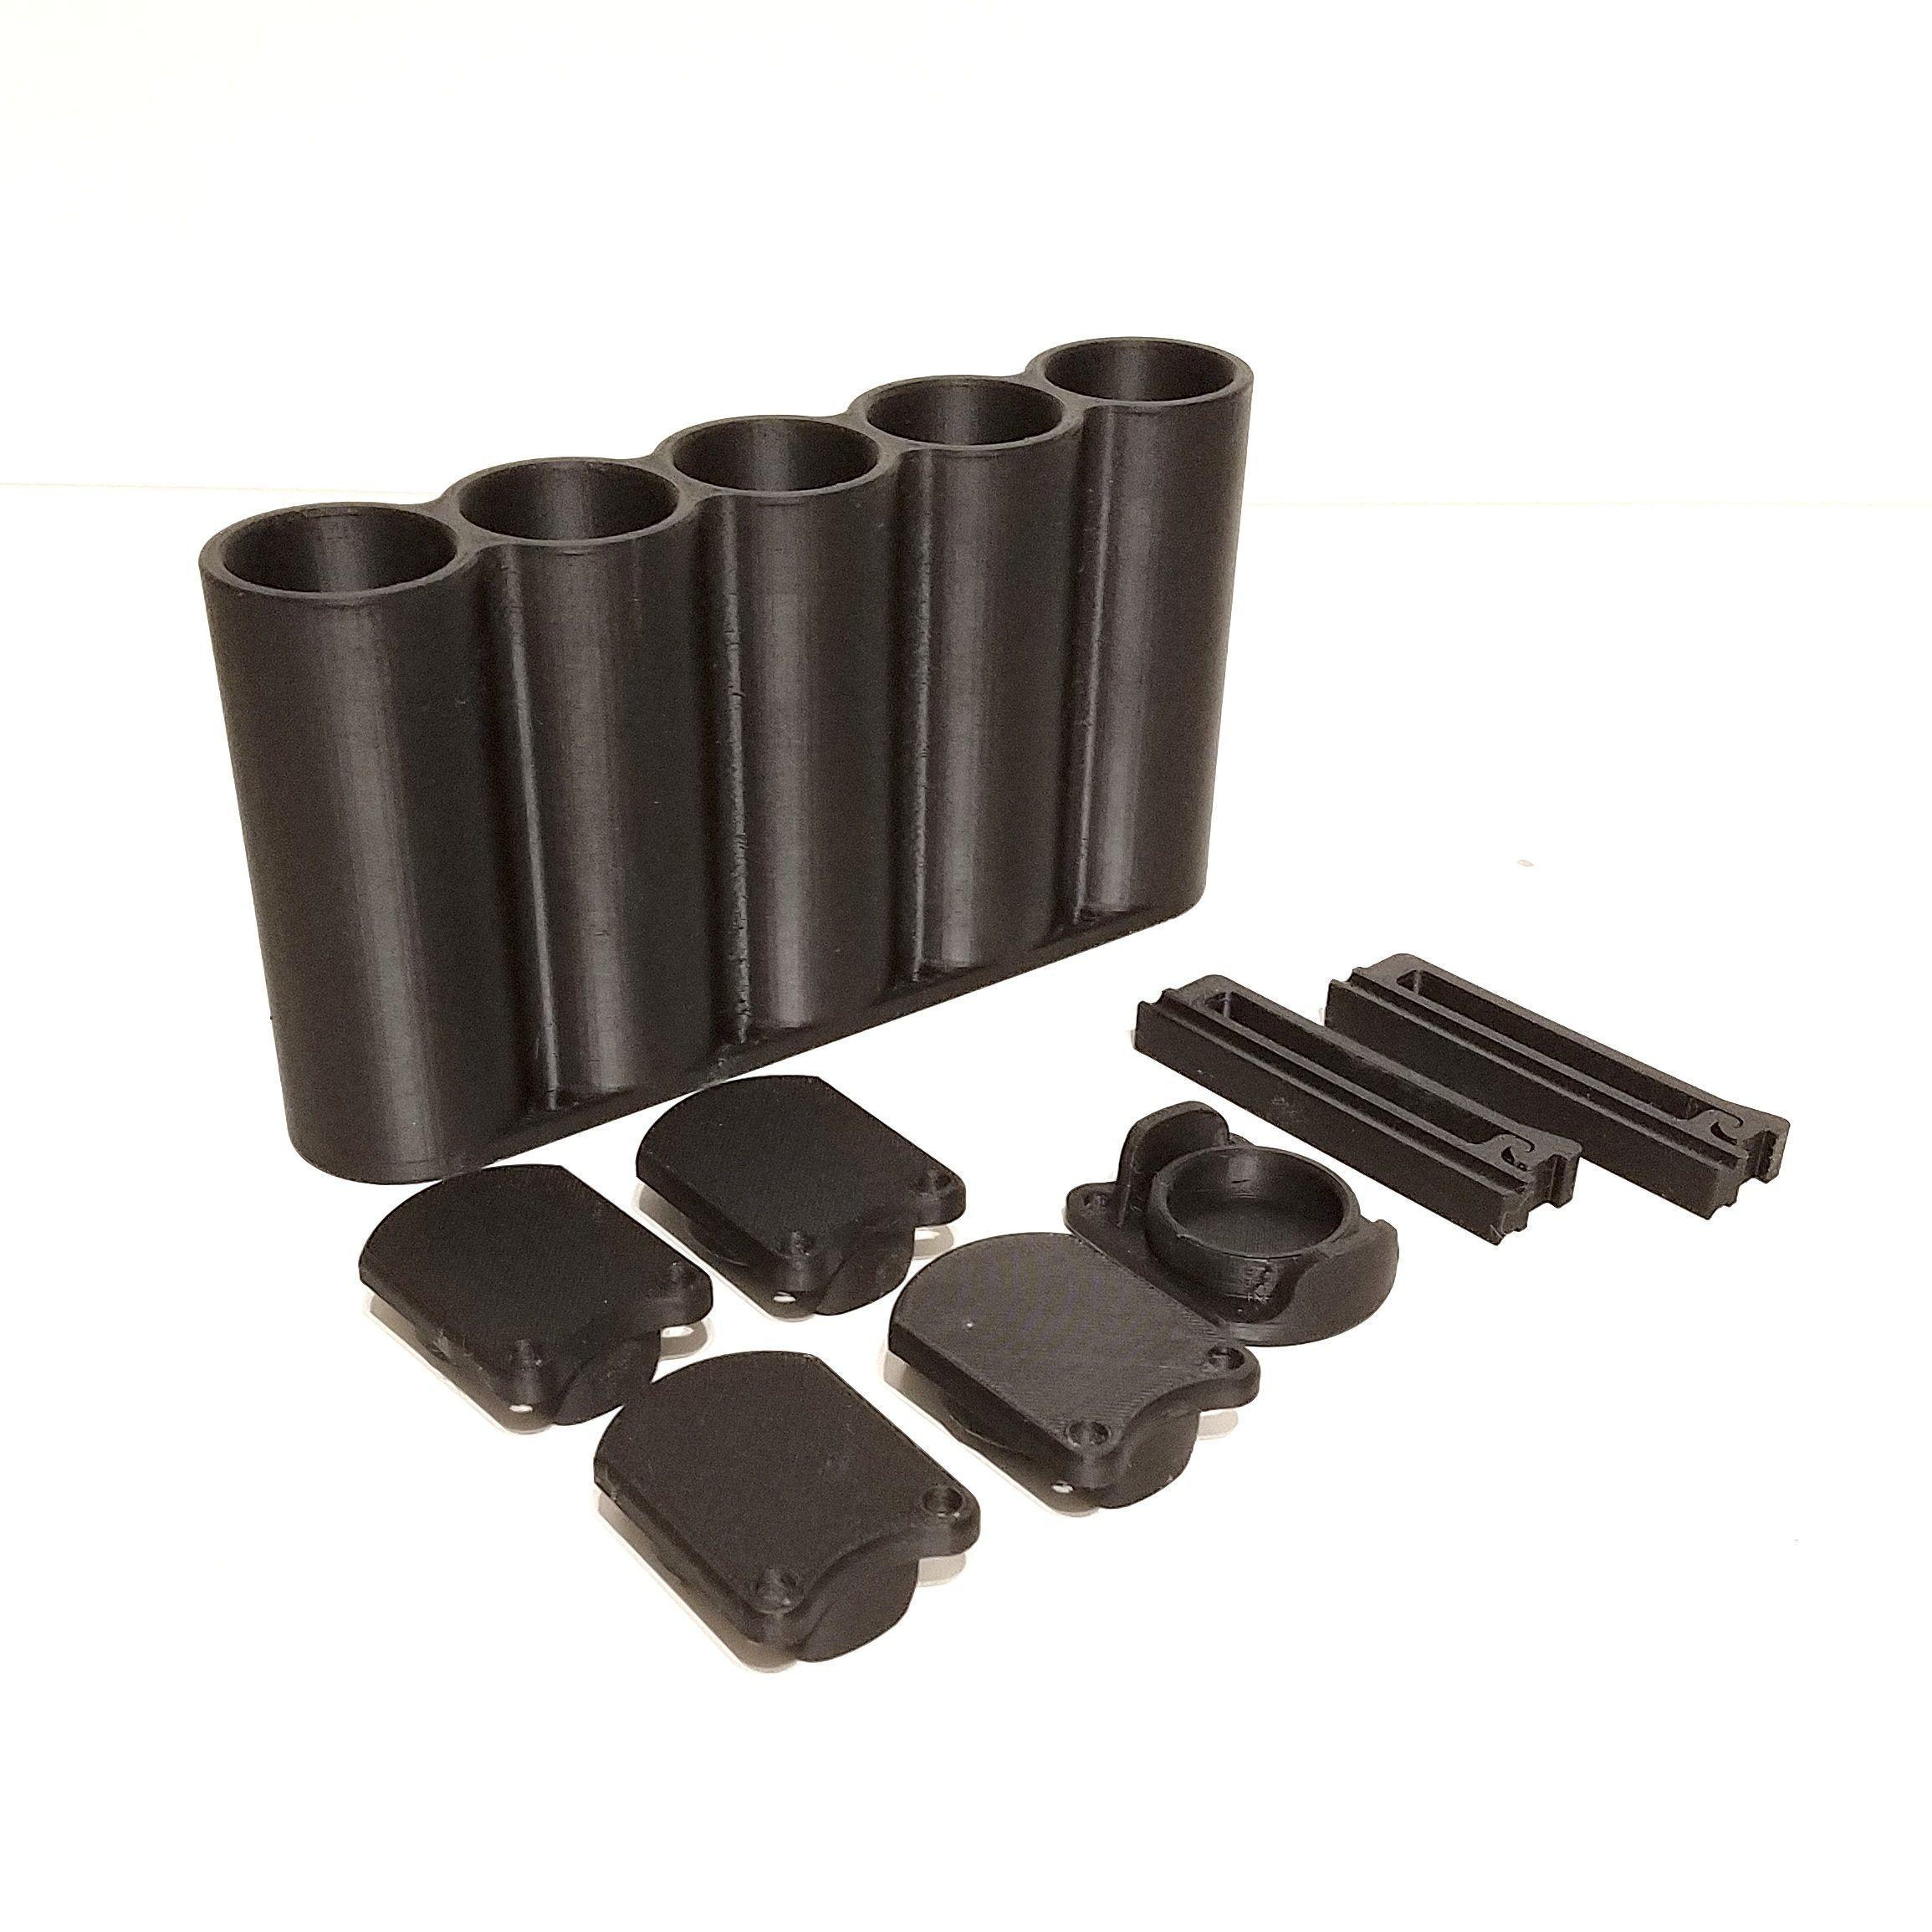 120 mm Film Rolls Container